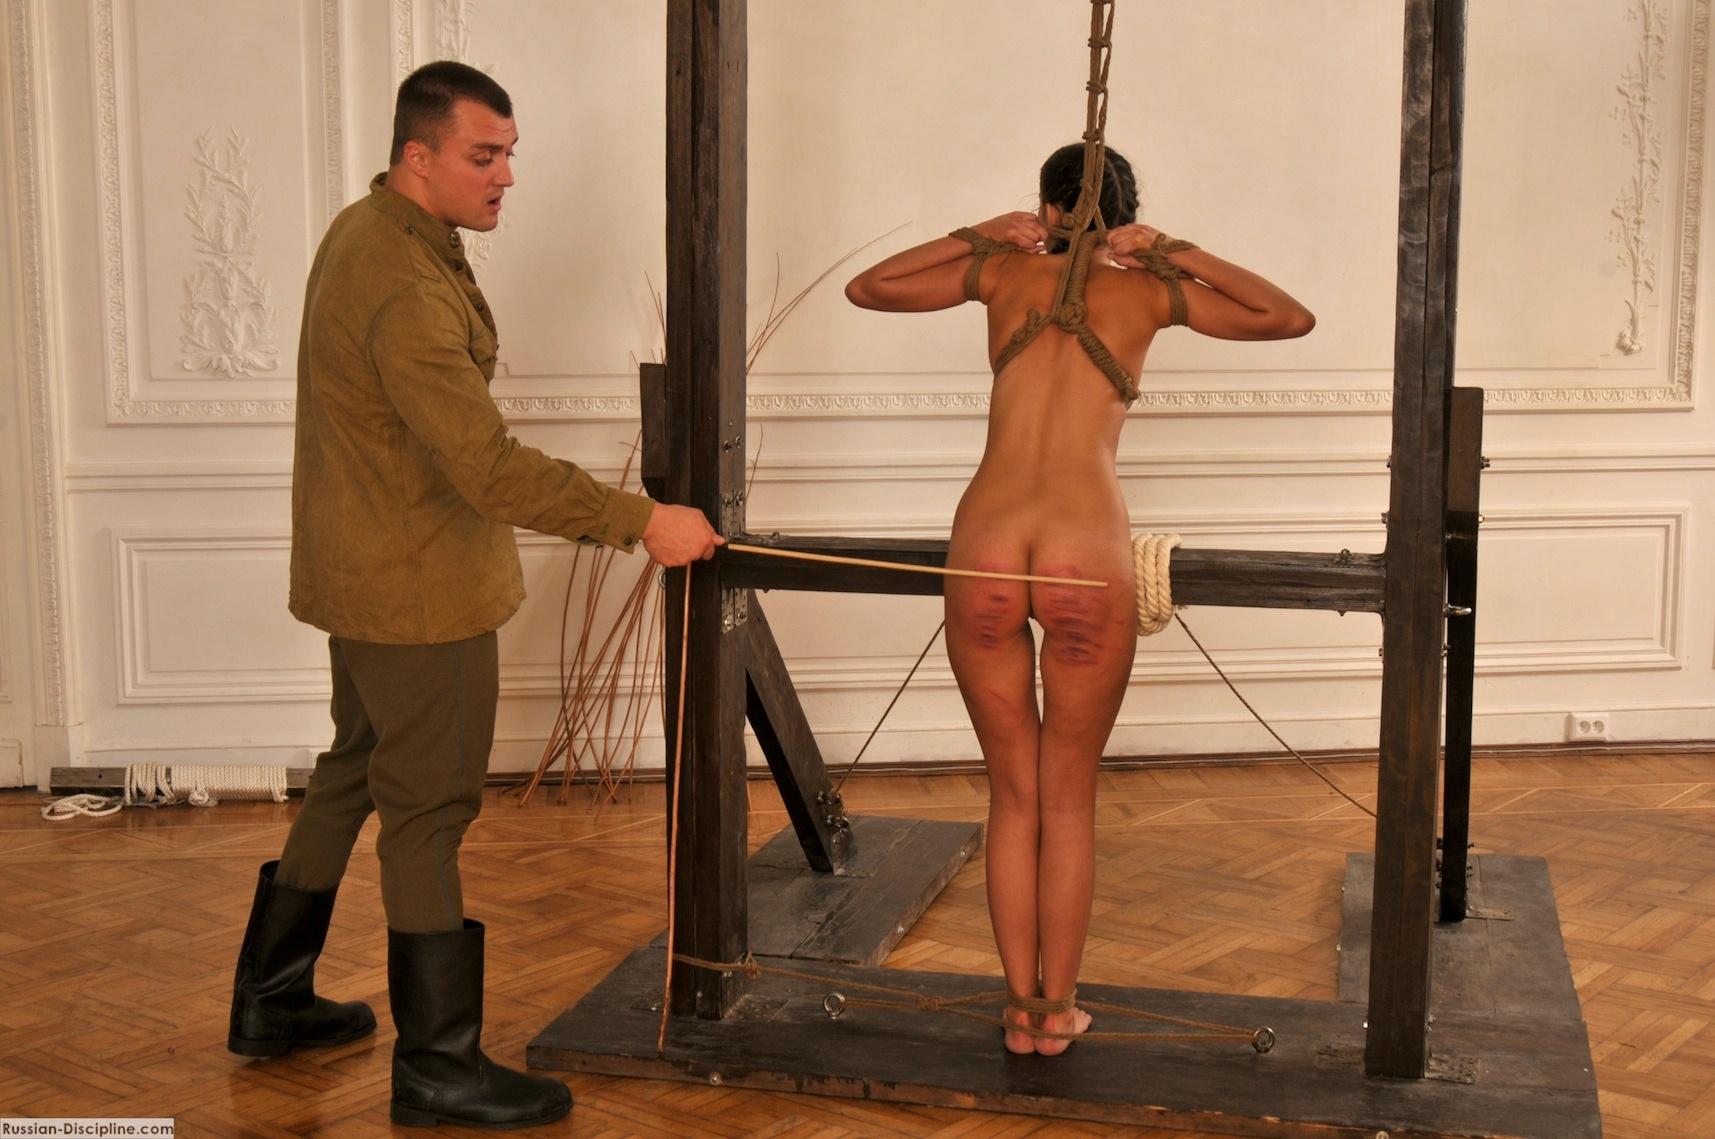 Russian punishment spank that bastard